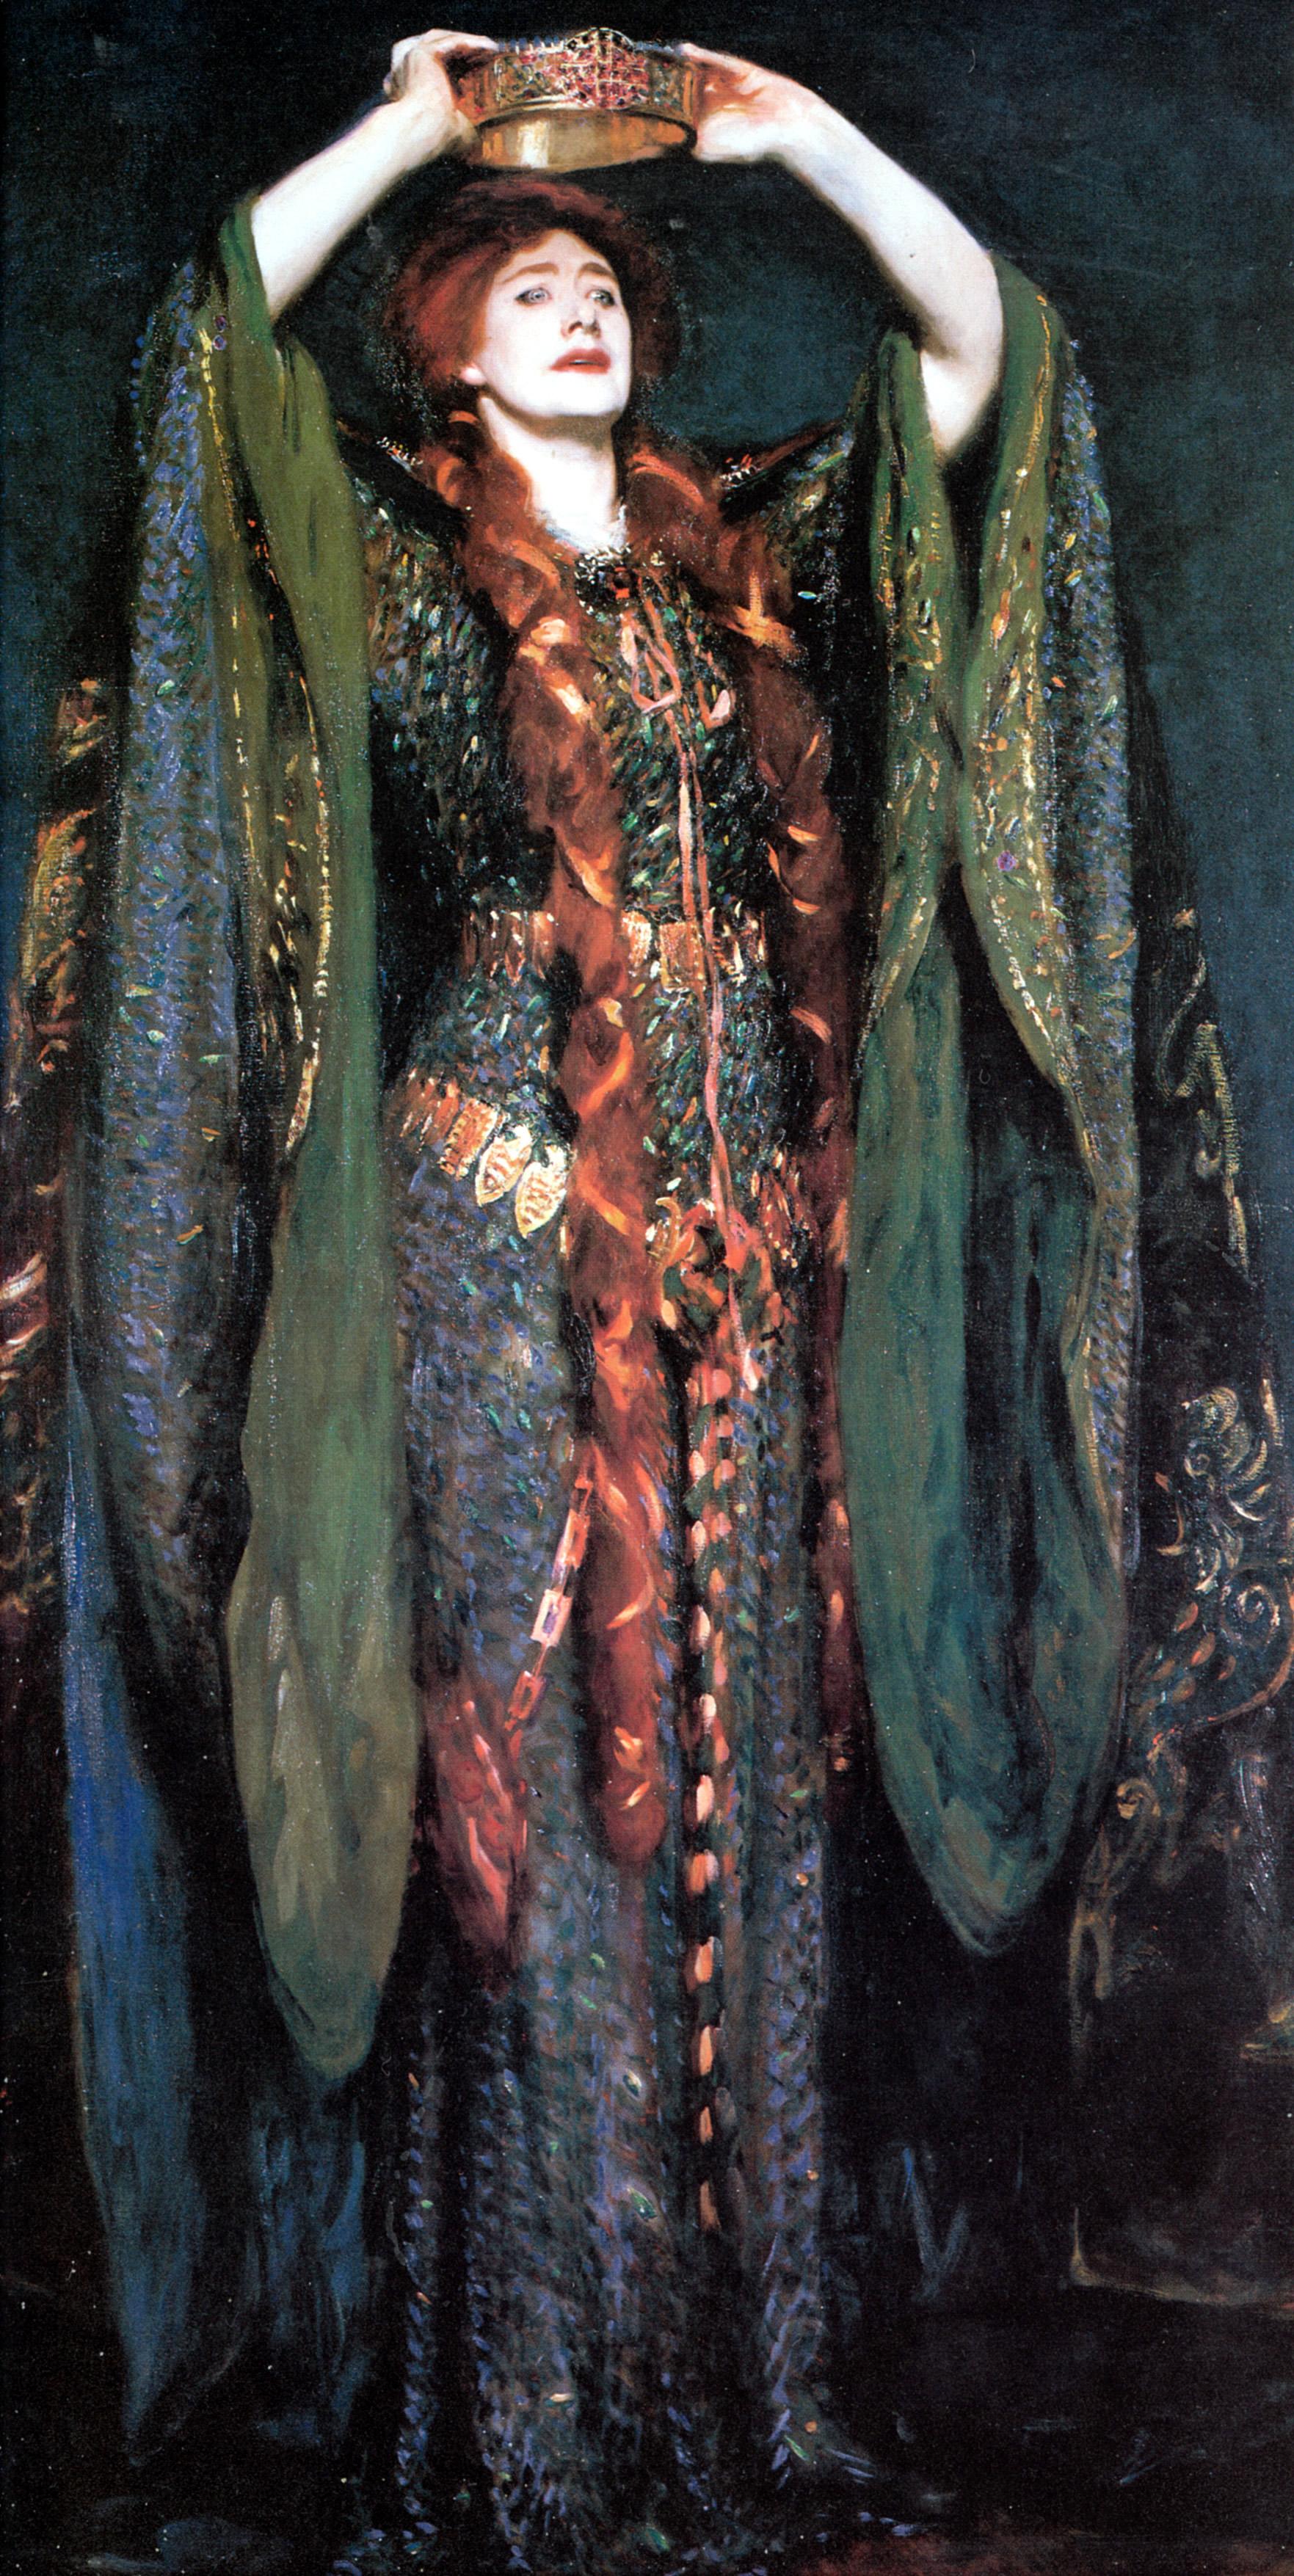 17. Dame Ellen Terry as Lady Macbeth, John Singer Sargent, 1889